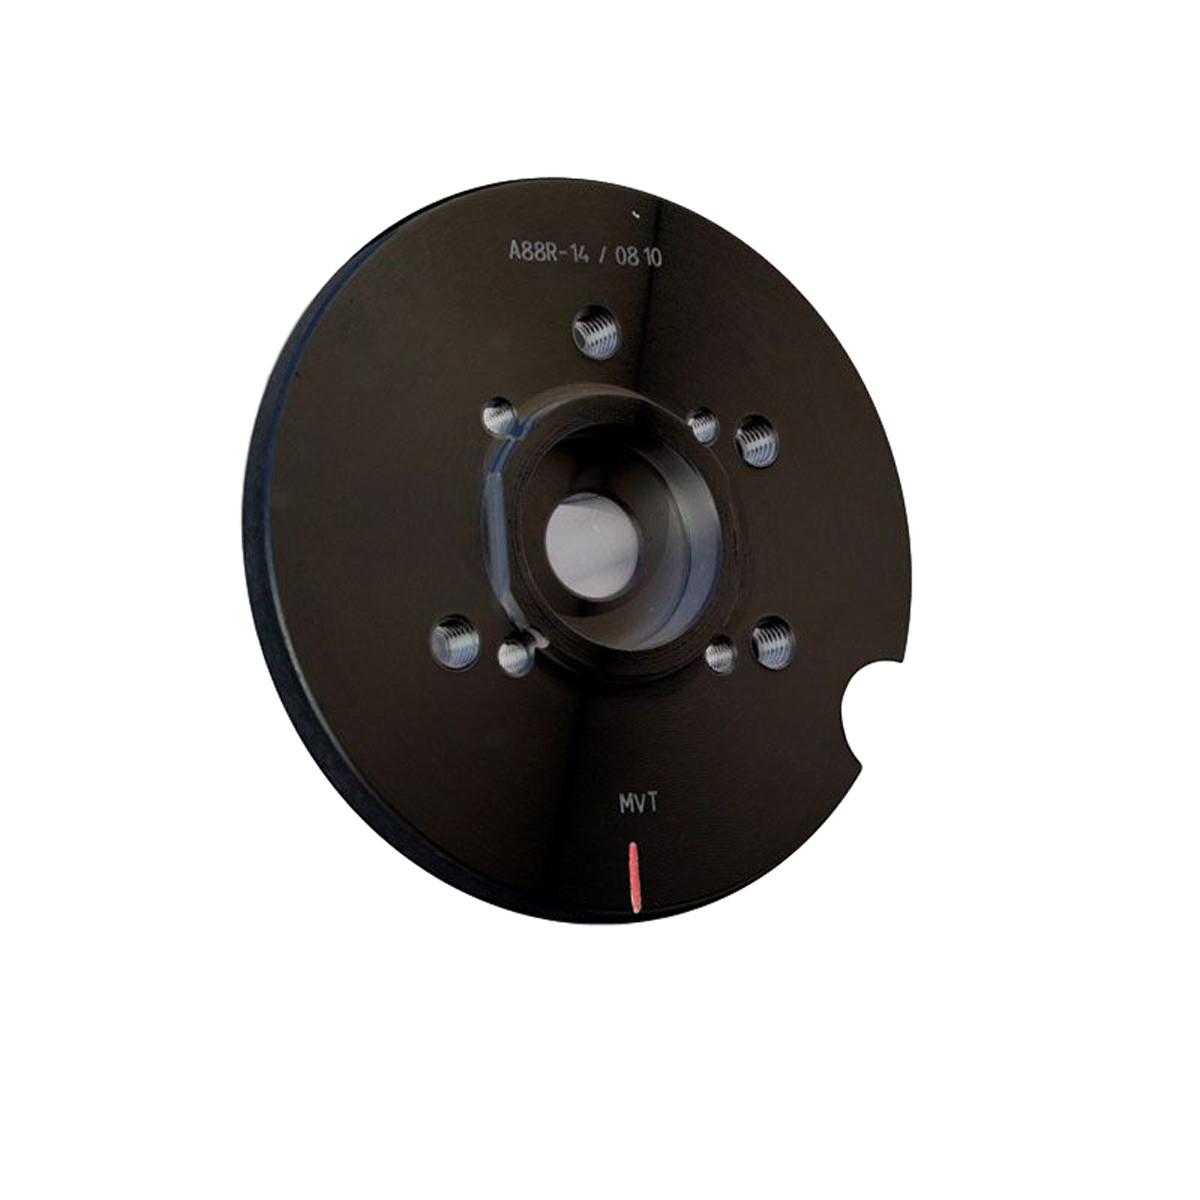 Rotor Allumage CPI - KEEWAY- MVT Digital Direct DD23